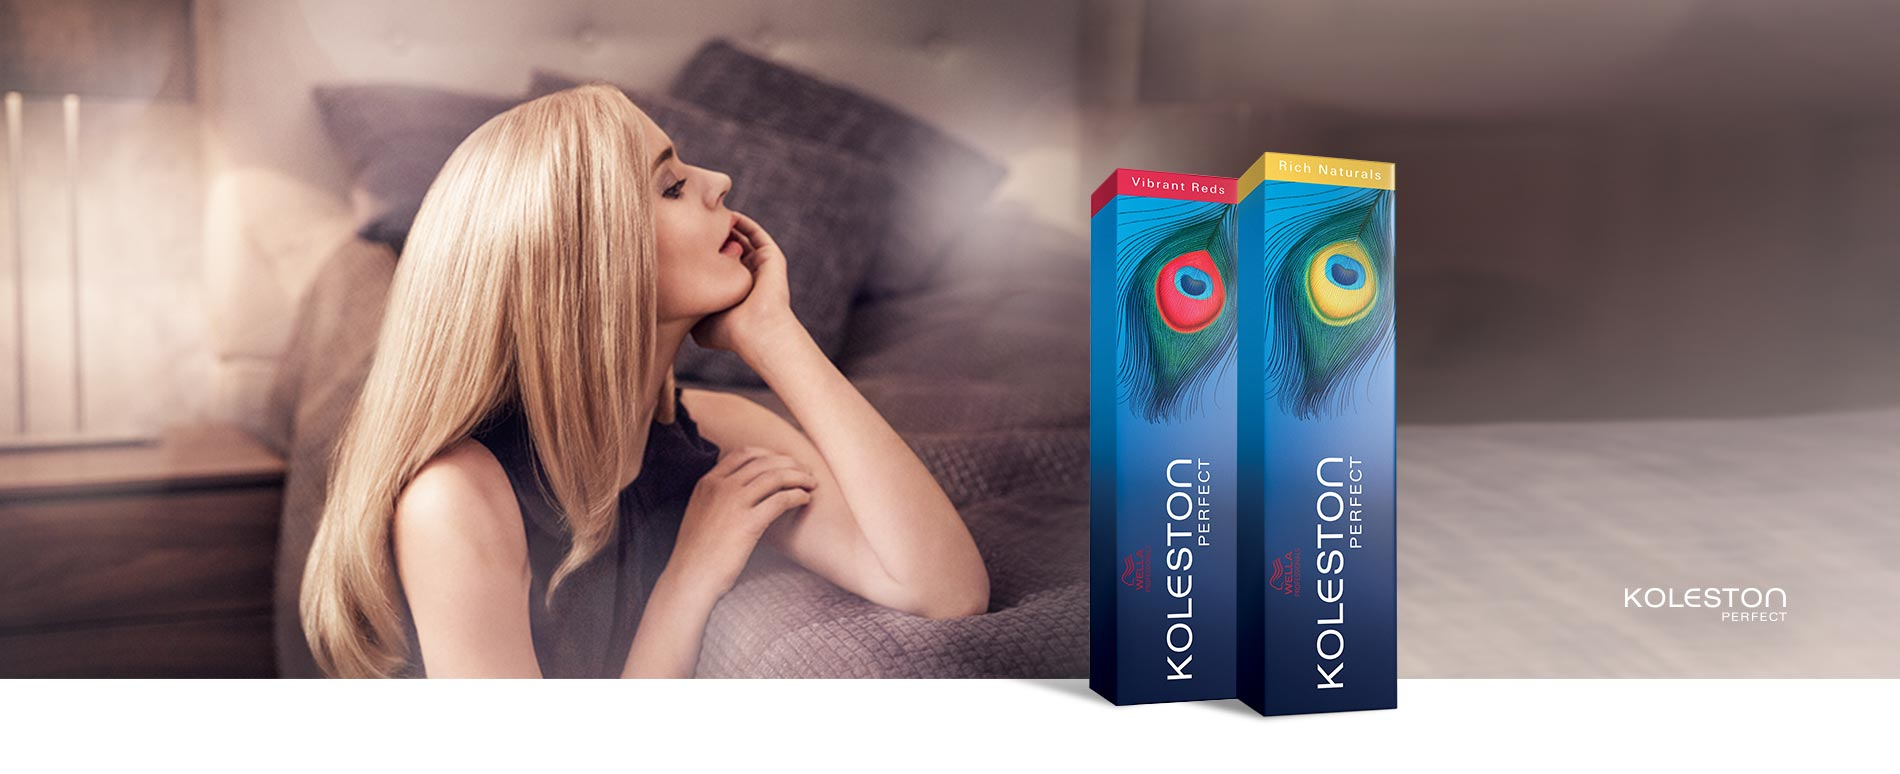 Koleston Perfect Hair Colour Wella Professionals